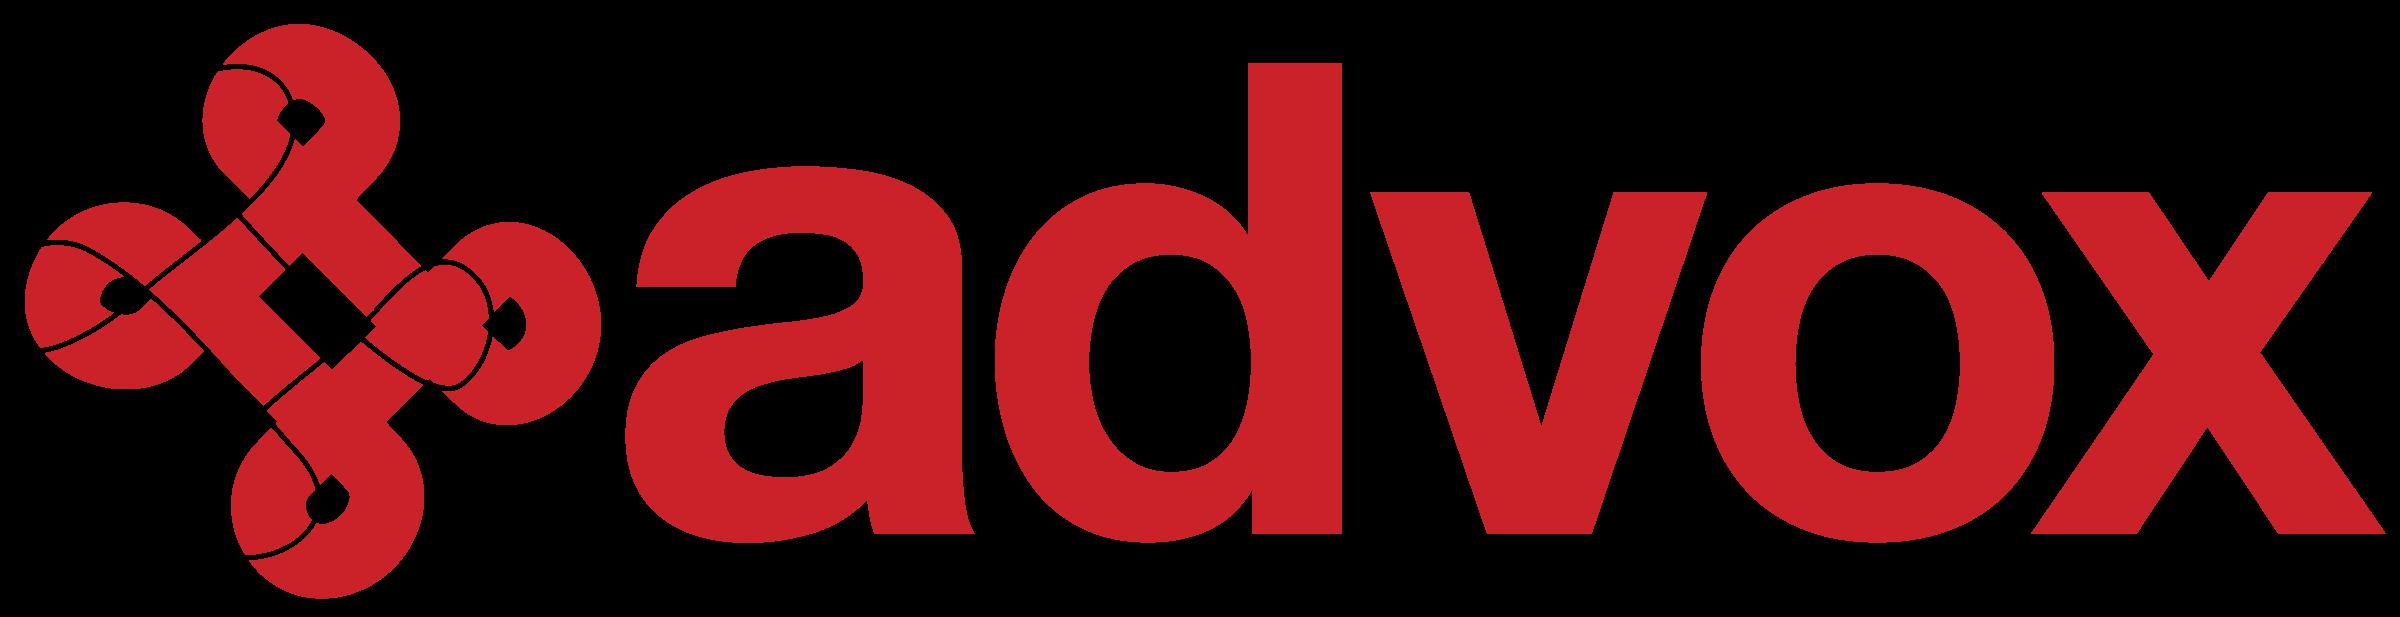 advox-redblack-transparent-2400.png